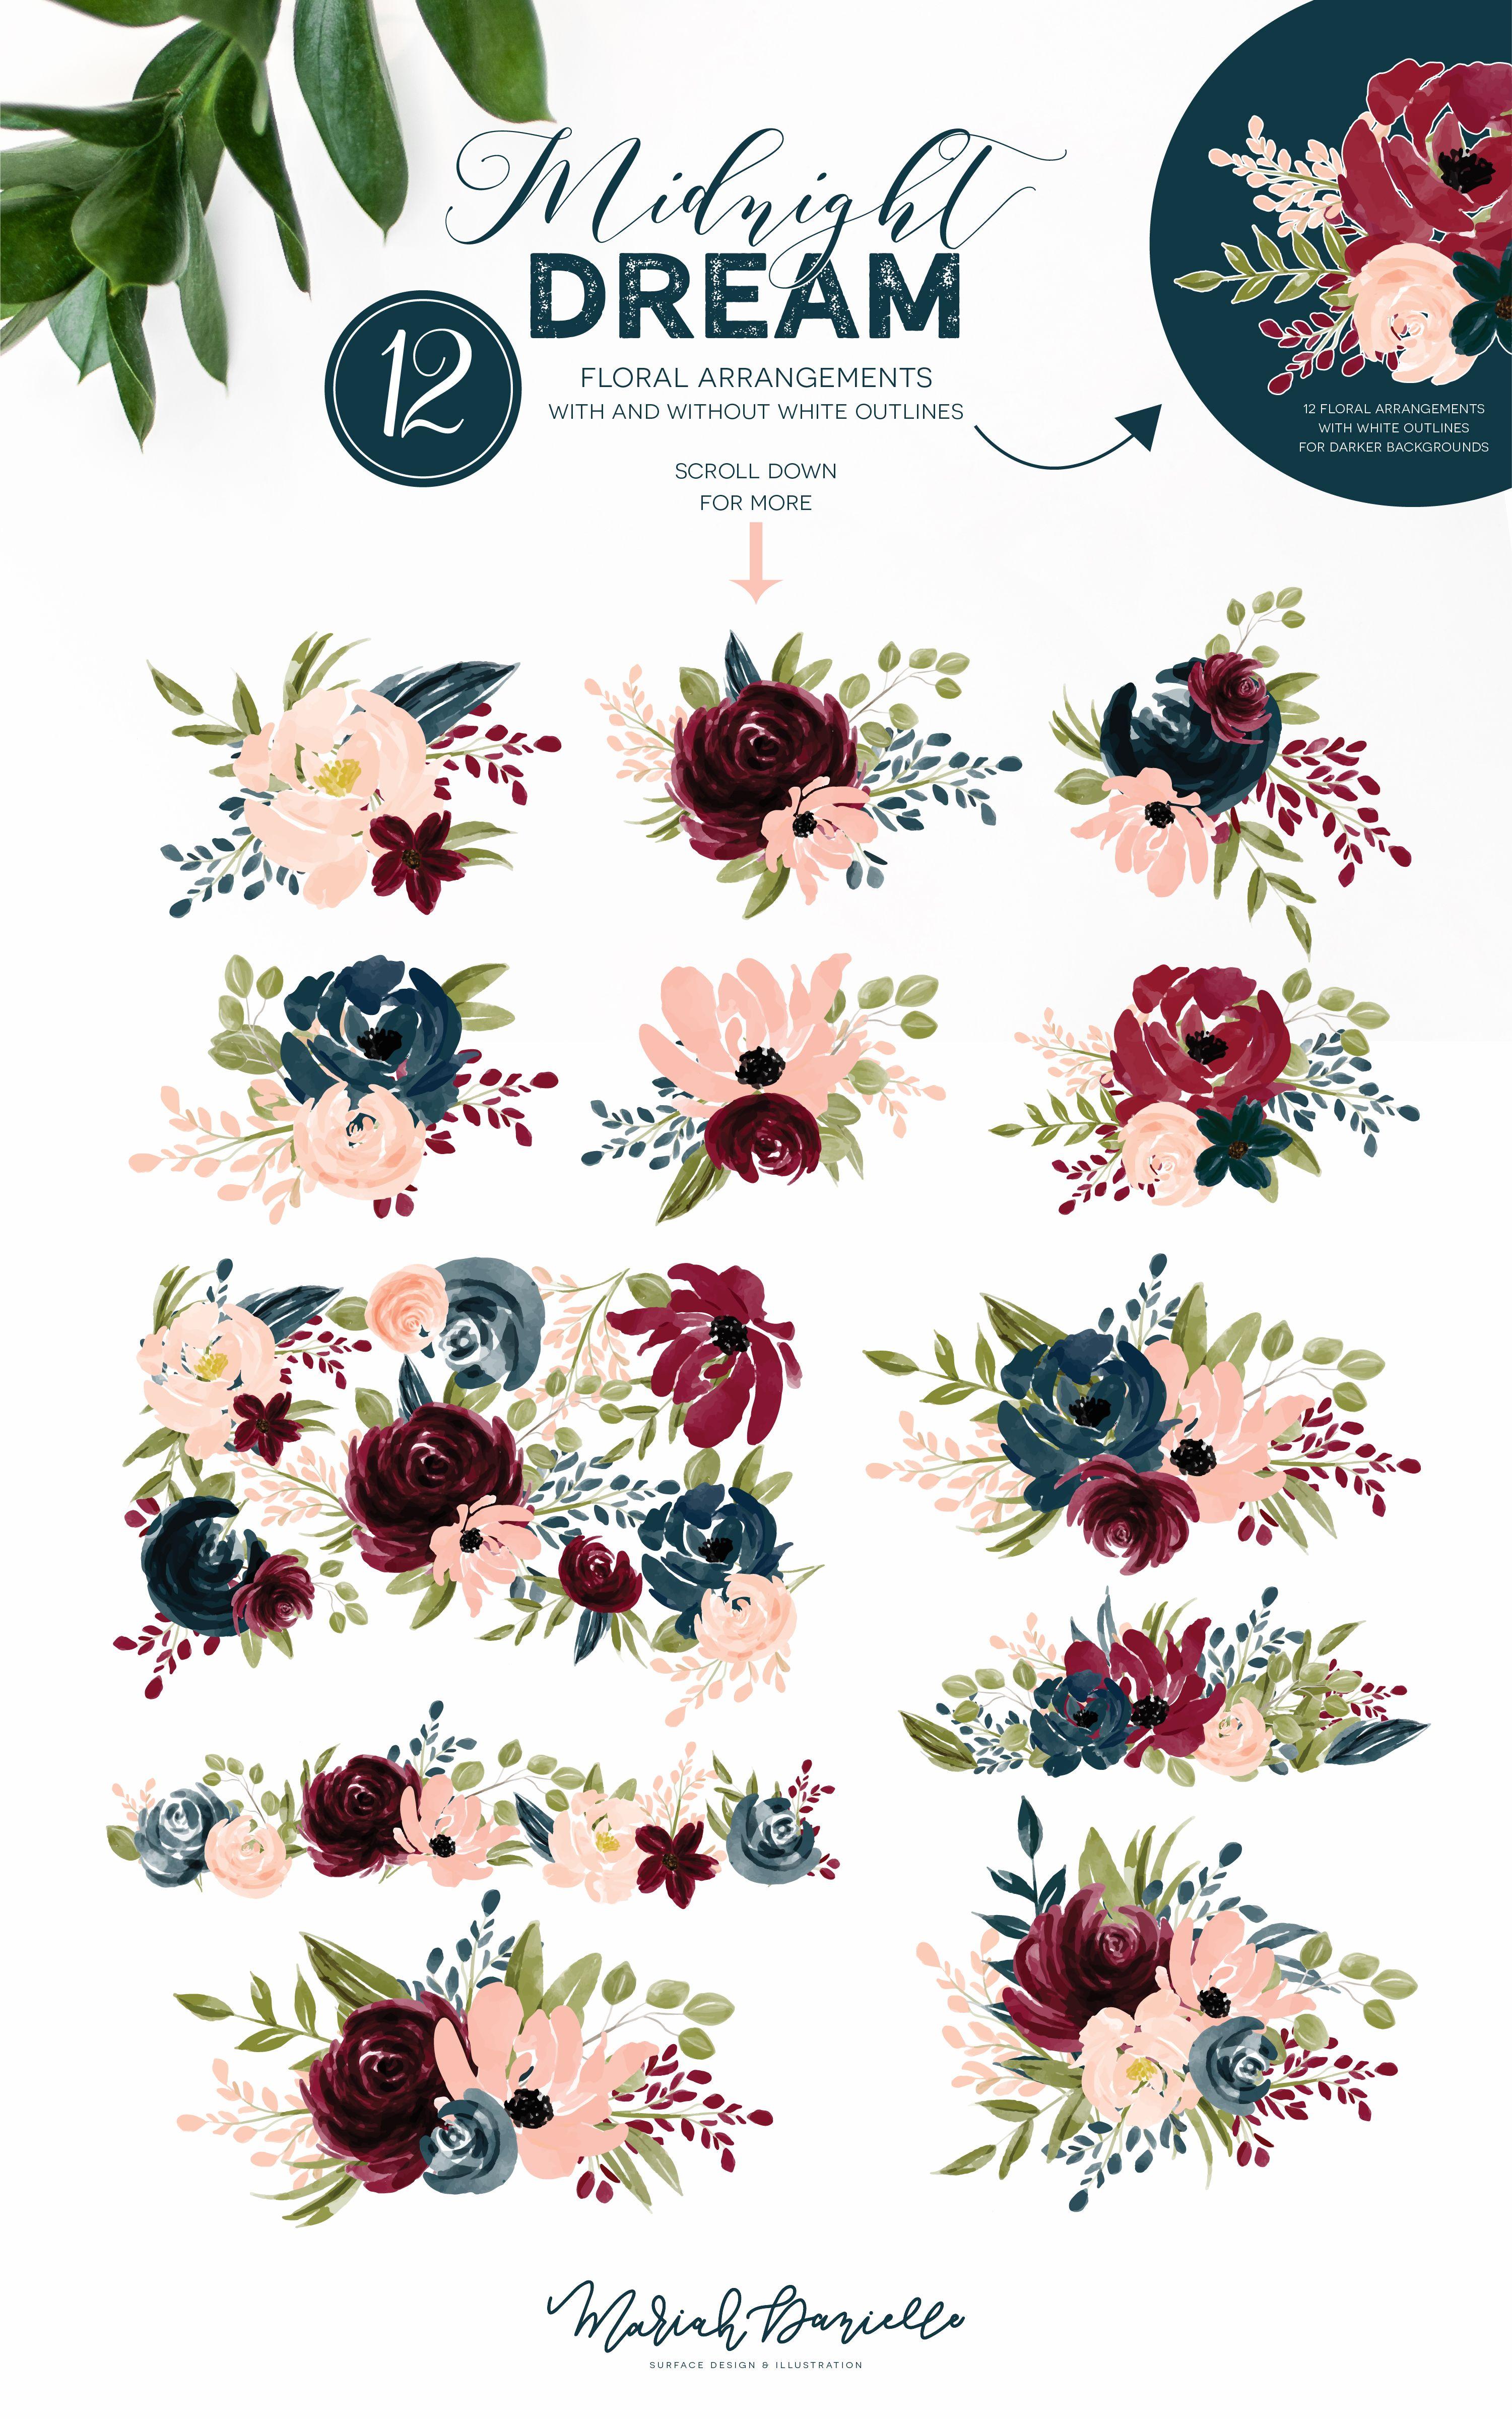 burgundy navy flower graphic set illustrations hand drawn floral illustrations diy wedding [ 3001 x 4800 Pixel ]